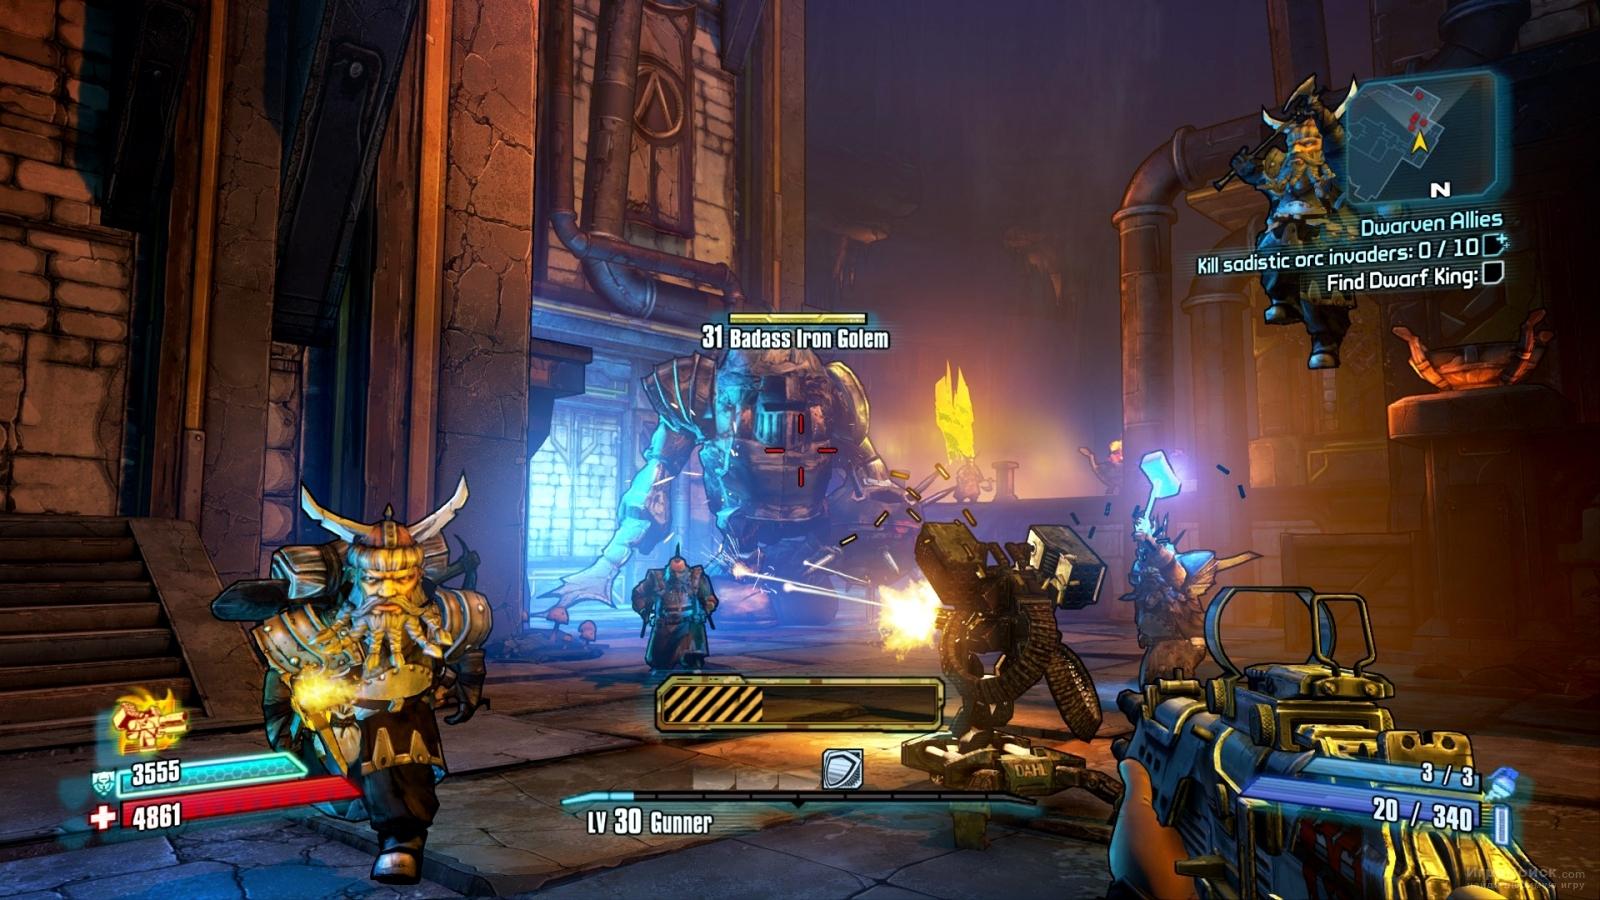 Скриншот к игре Borderlands 2: Tiny Tina's Assault on Dragon Keep